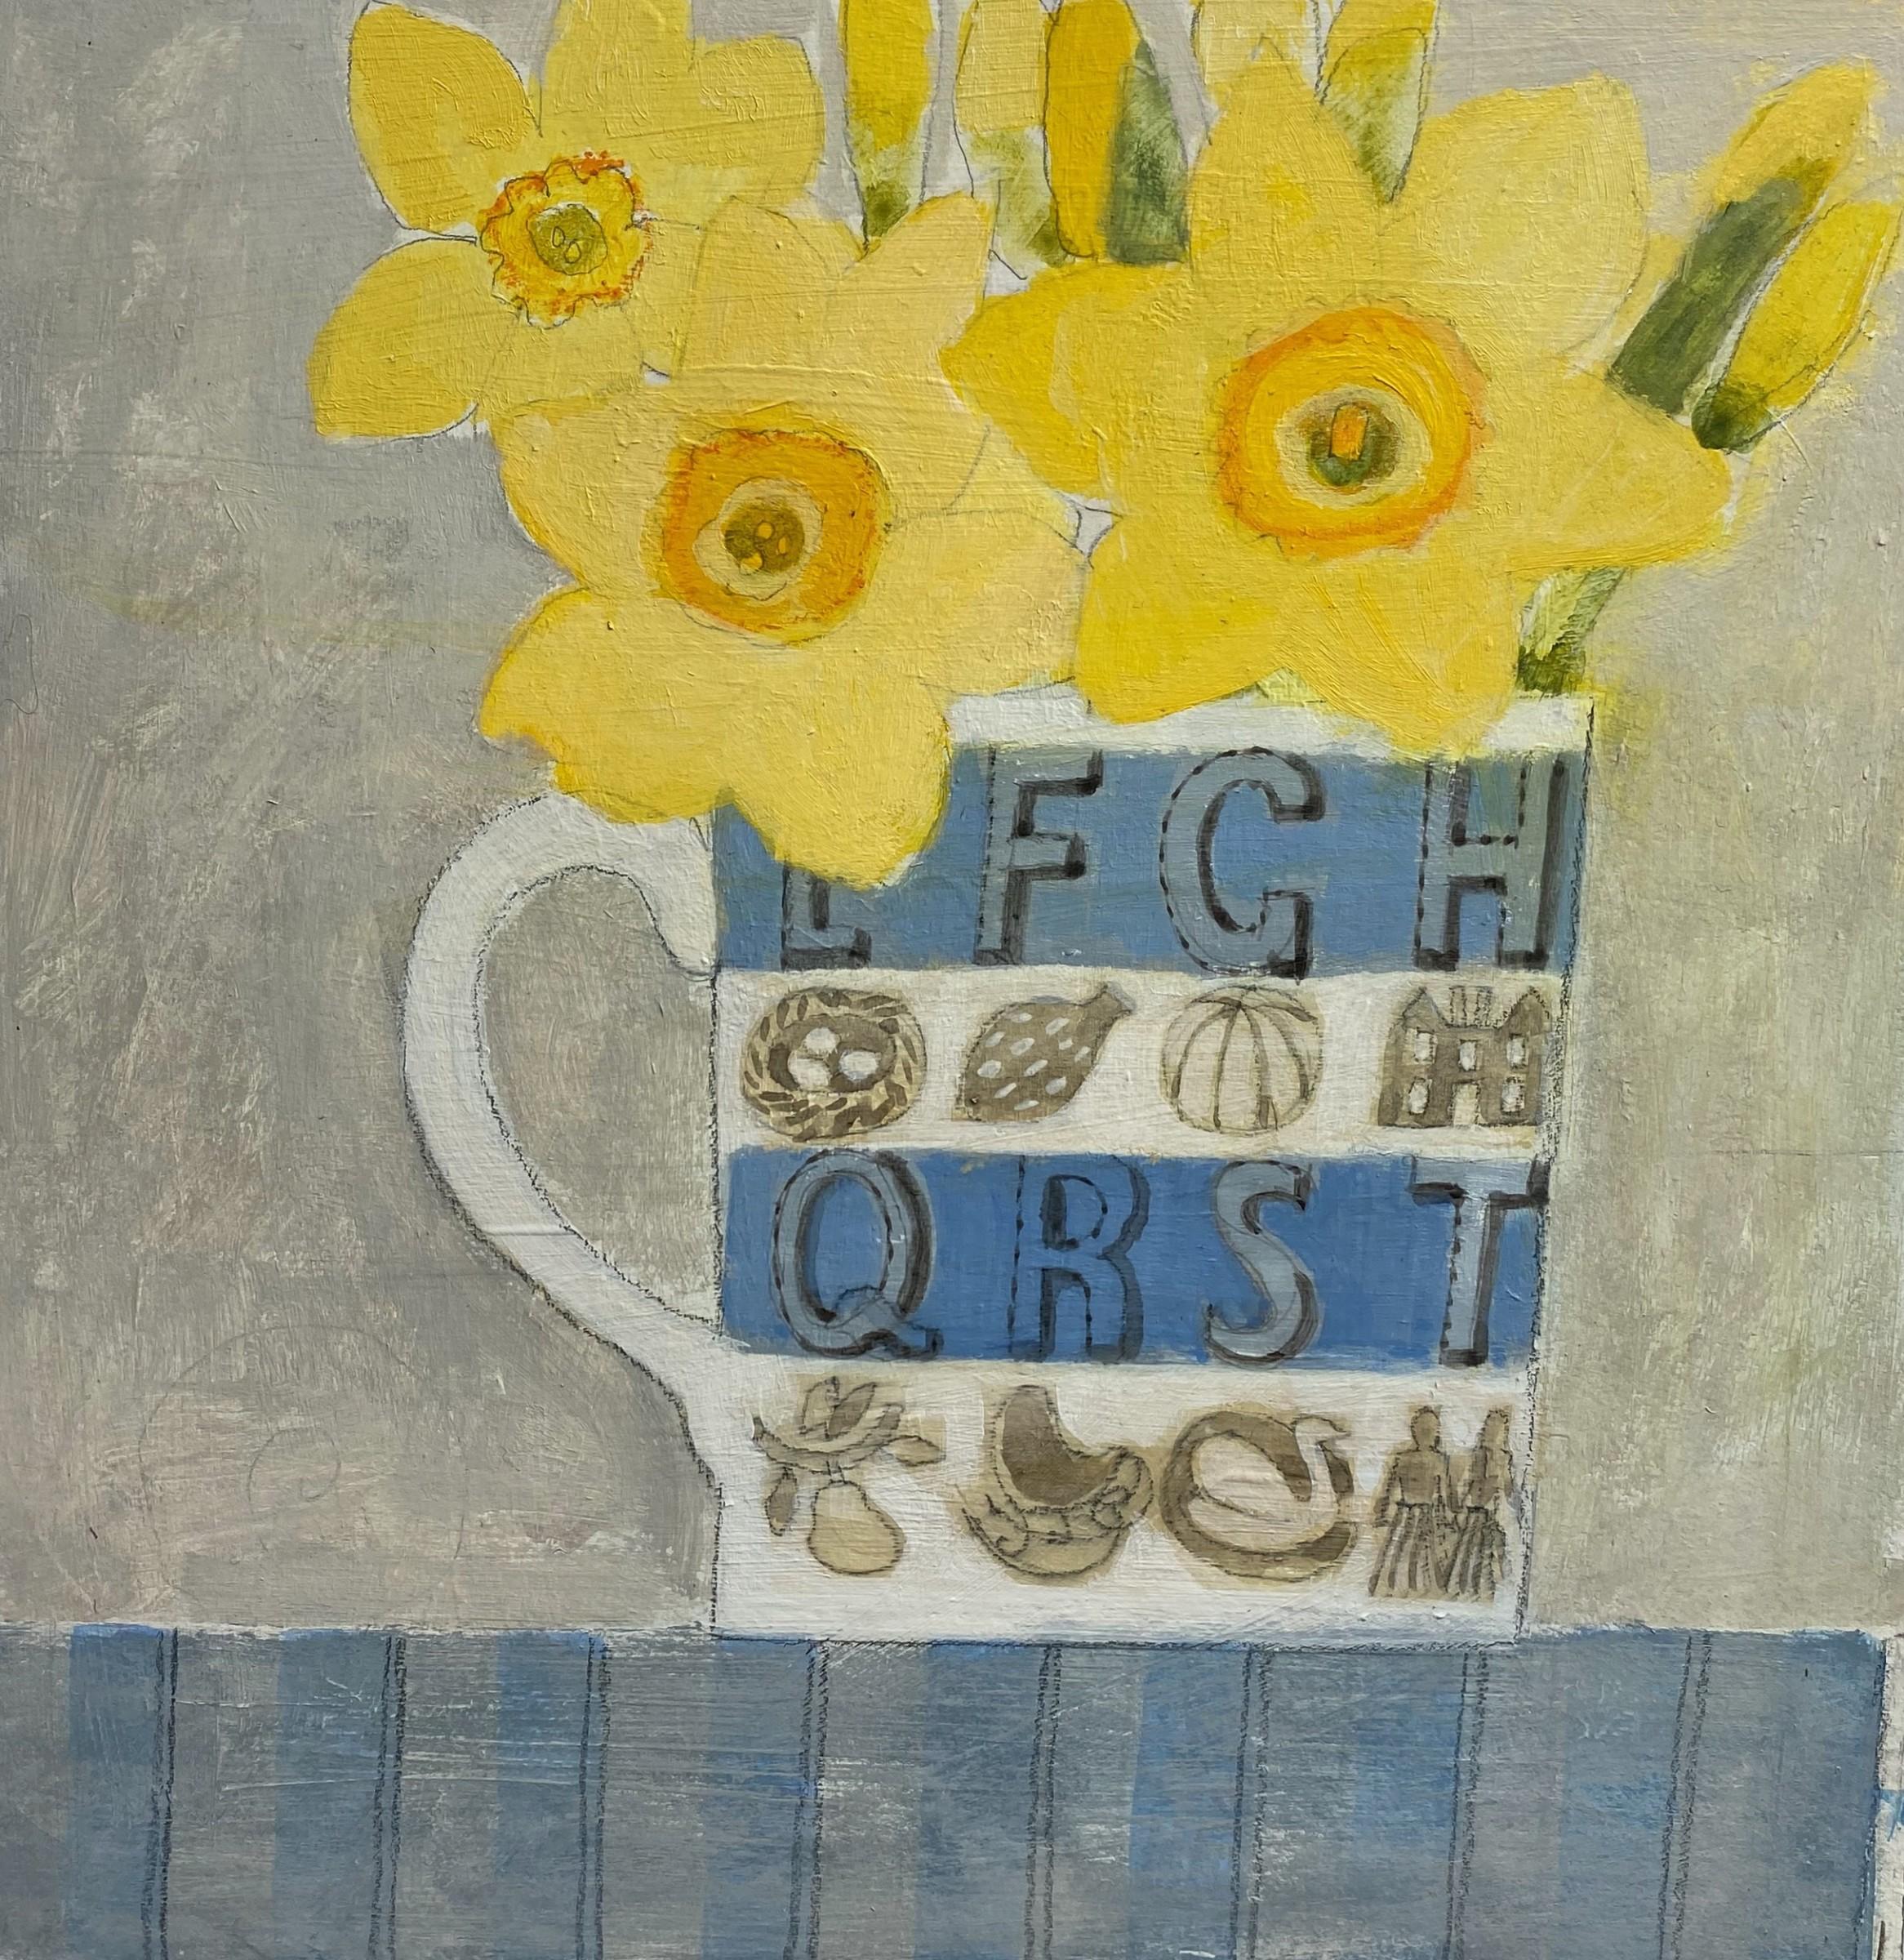 "<span class=""link fancybox-details-link""><a href=""/artists/30-jill-leman/works/12623-jill-leman-daffodils-in-eric-s-mug/"">View Detail Page</a></span><div class=""artist""><span class=""artist""><strong>Jill Leman</strong></span></div><div class=""title""><em>Daffodils in Eric's Mug</em></div><div class=""medium"">watercolour</div><div class=""dimensions"">21 x 21cm</div><div class=""price"">£400.00</div>"